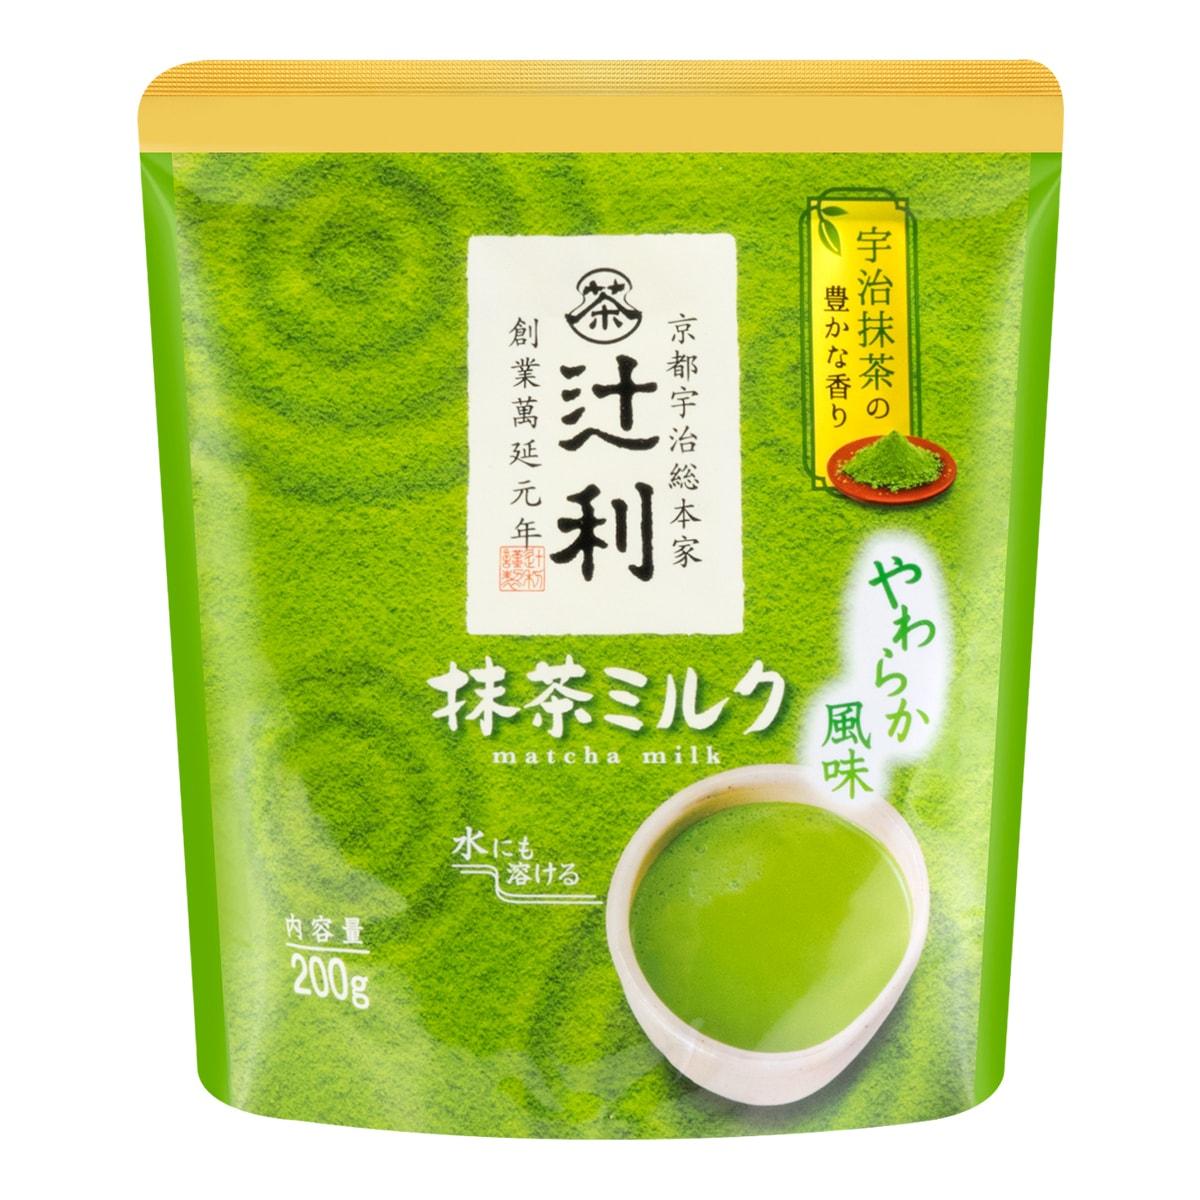 KATAOKA Milk and Matcha Tea Powder 200g